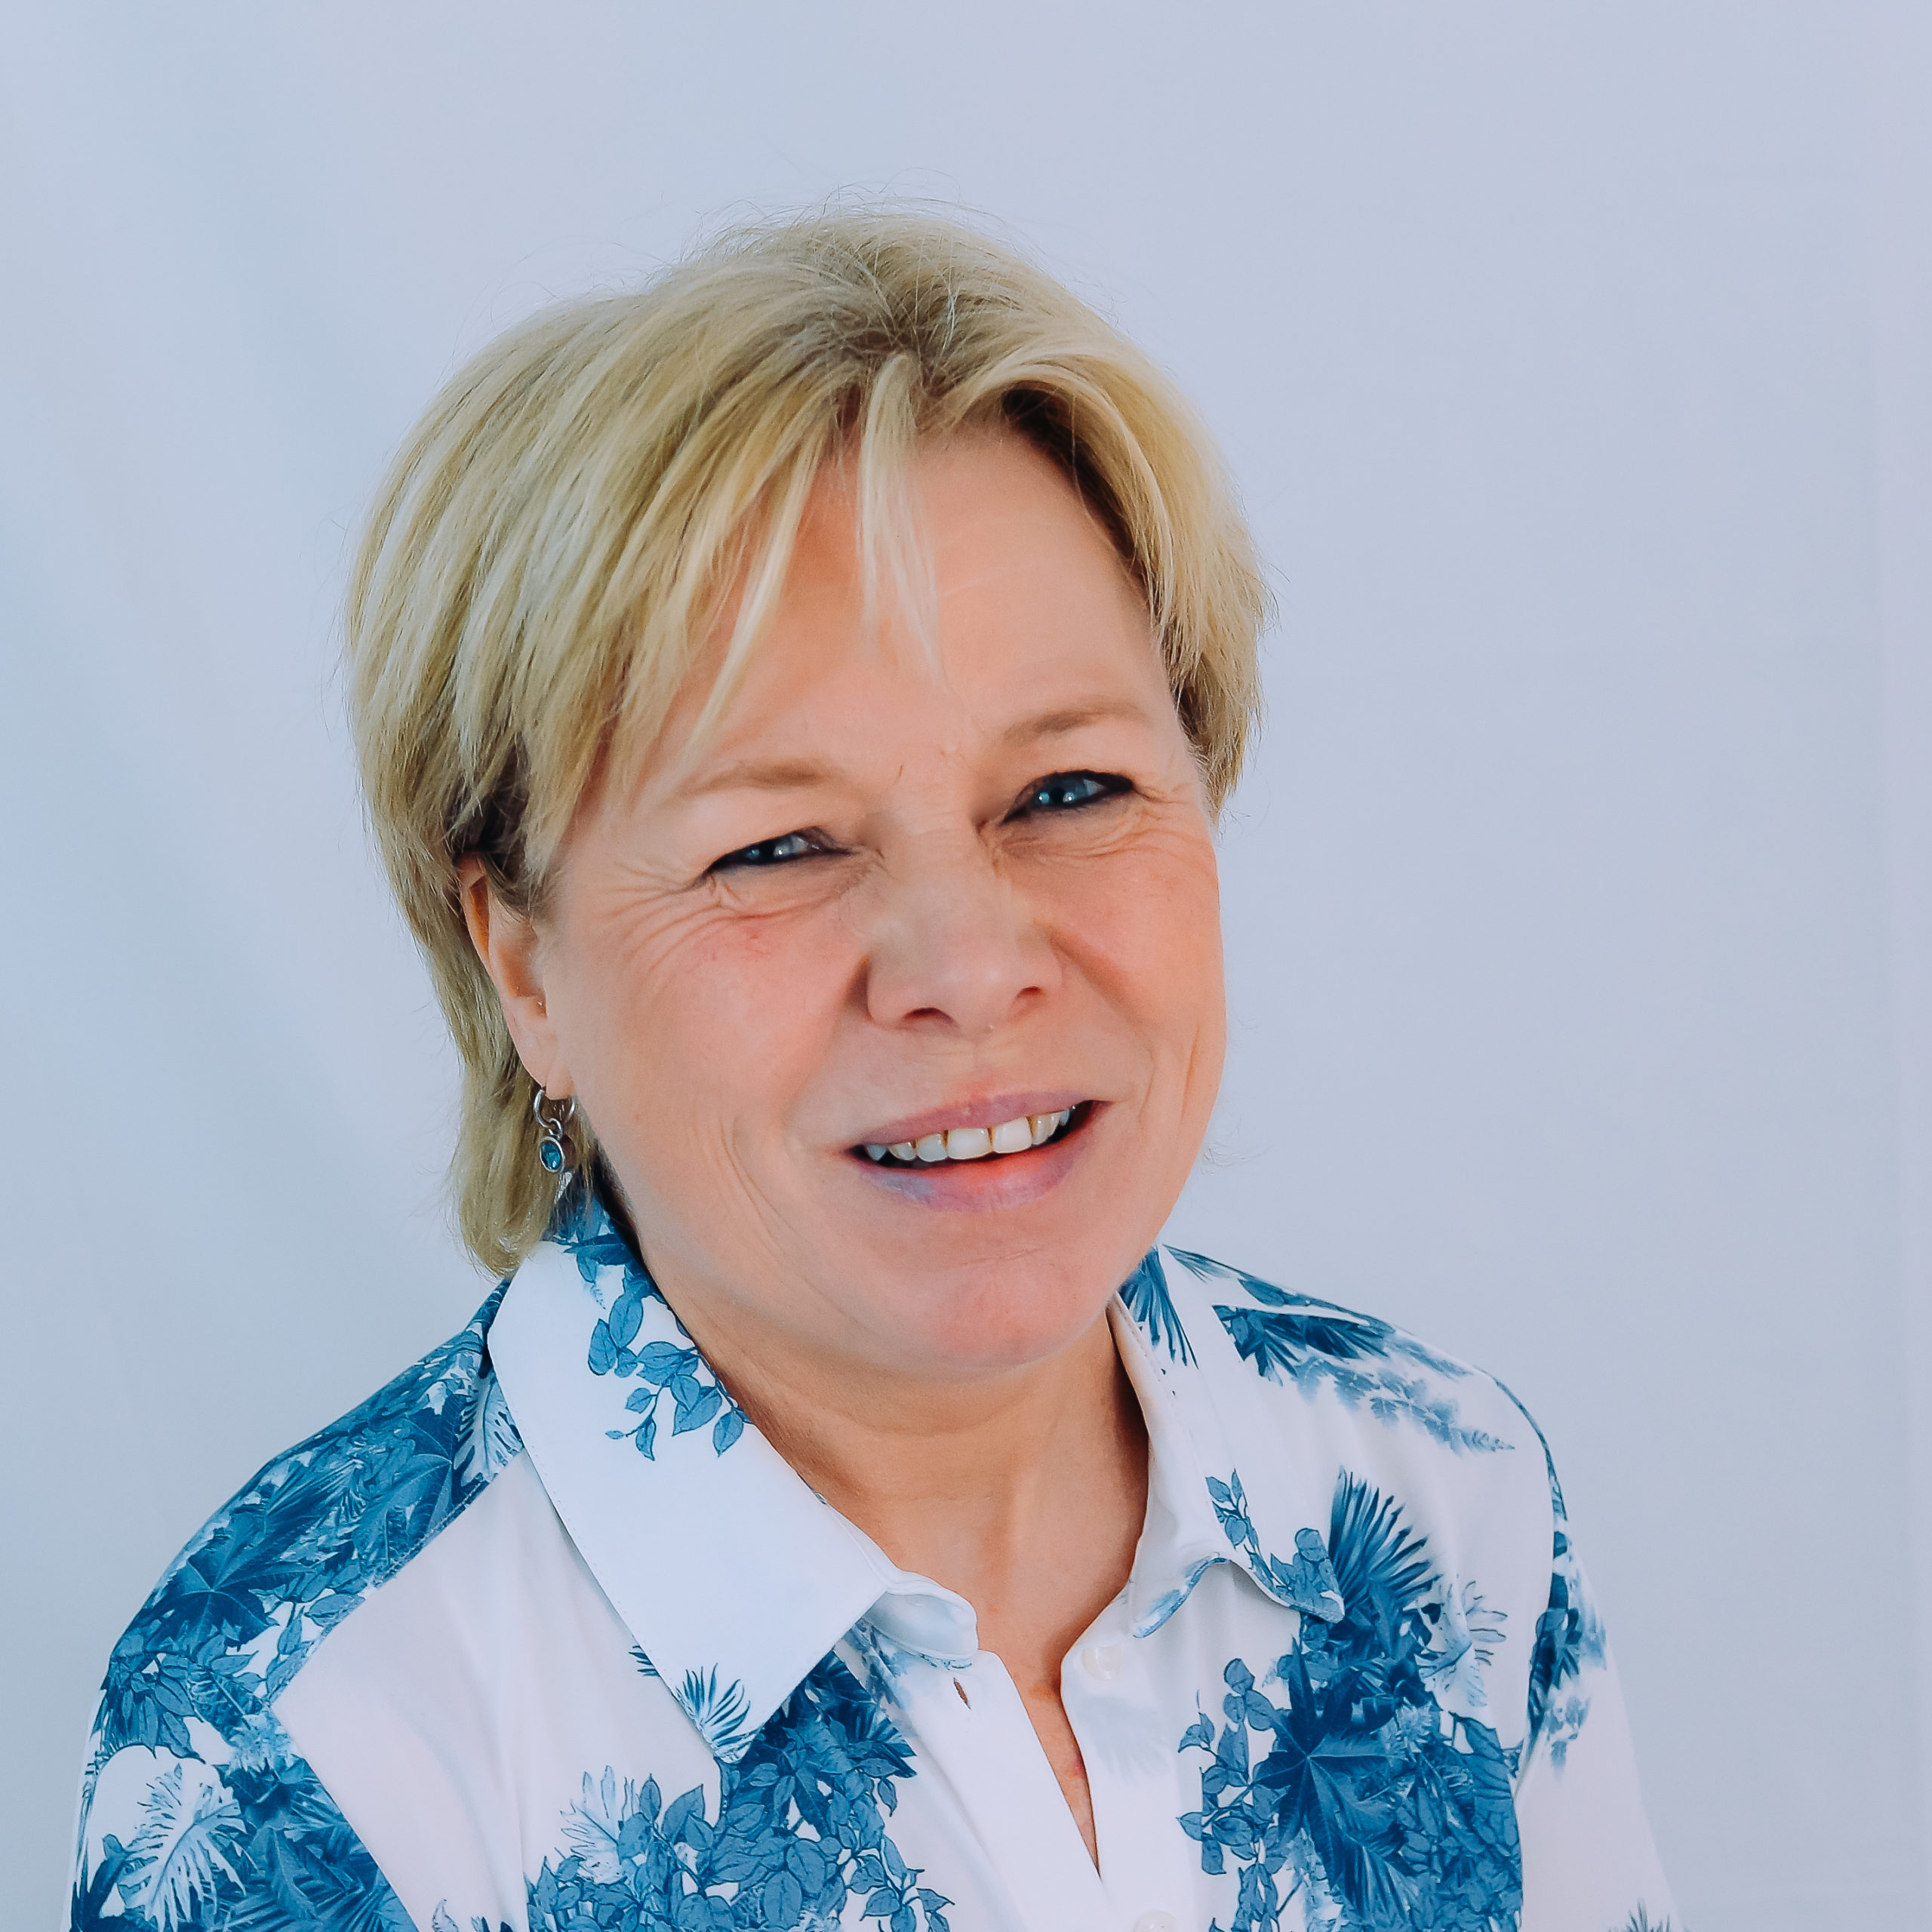 Silvia Zander